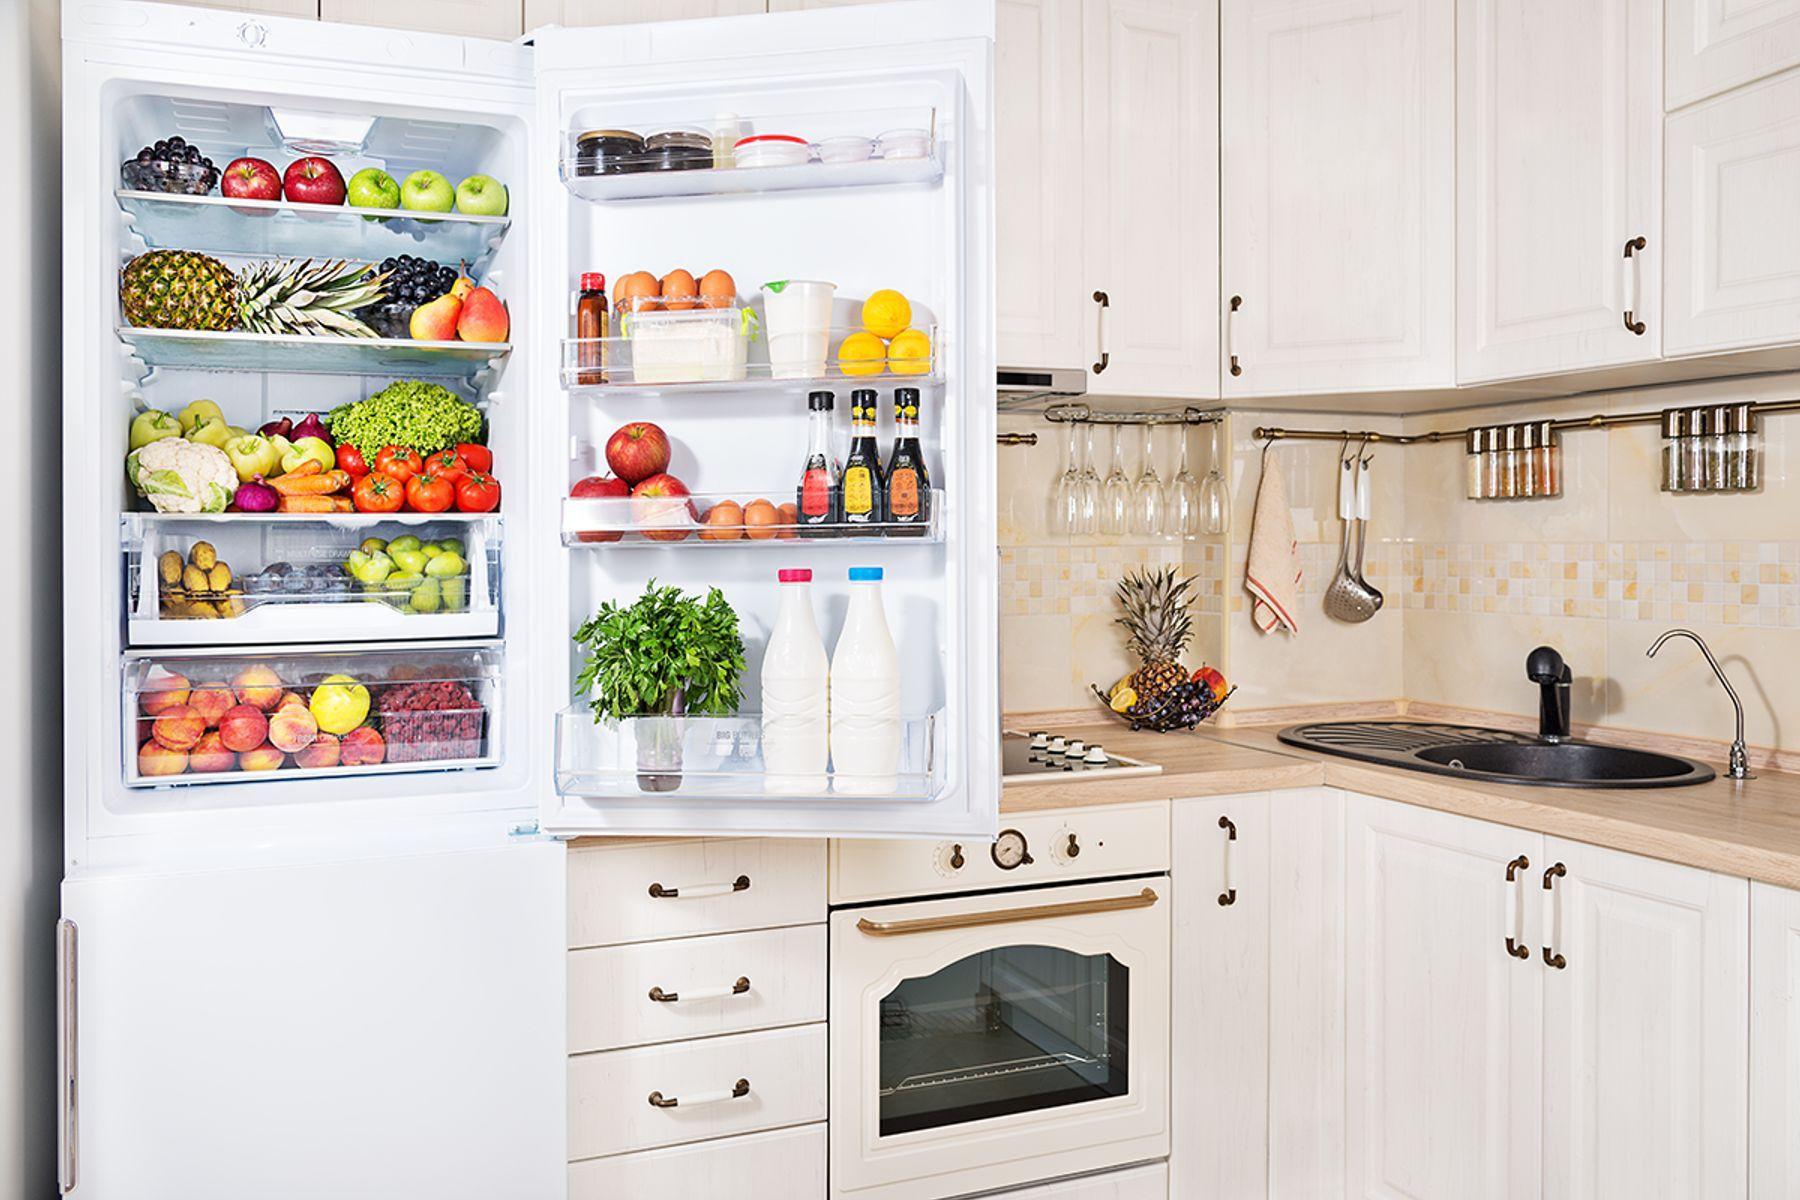 Open fridge in a kitchen